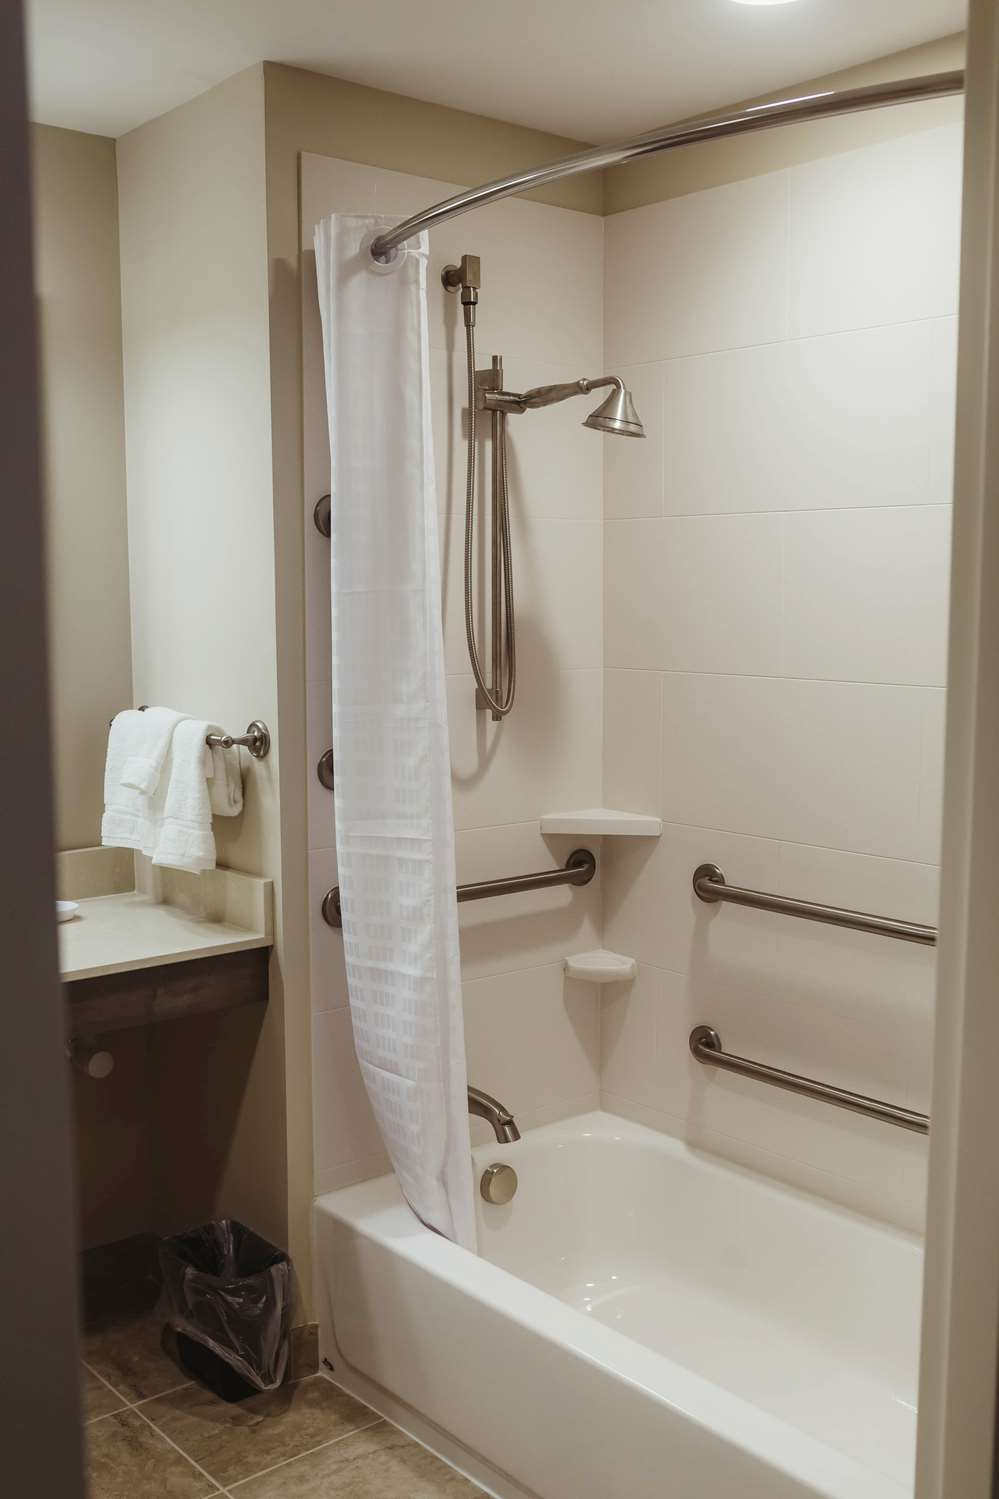 Best Western Hotel Room: Best Western Plus Centralia Hotel, IL